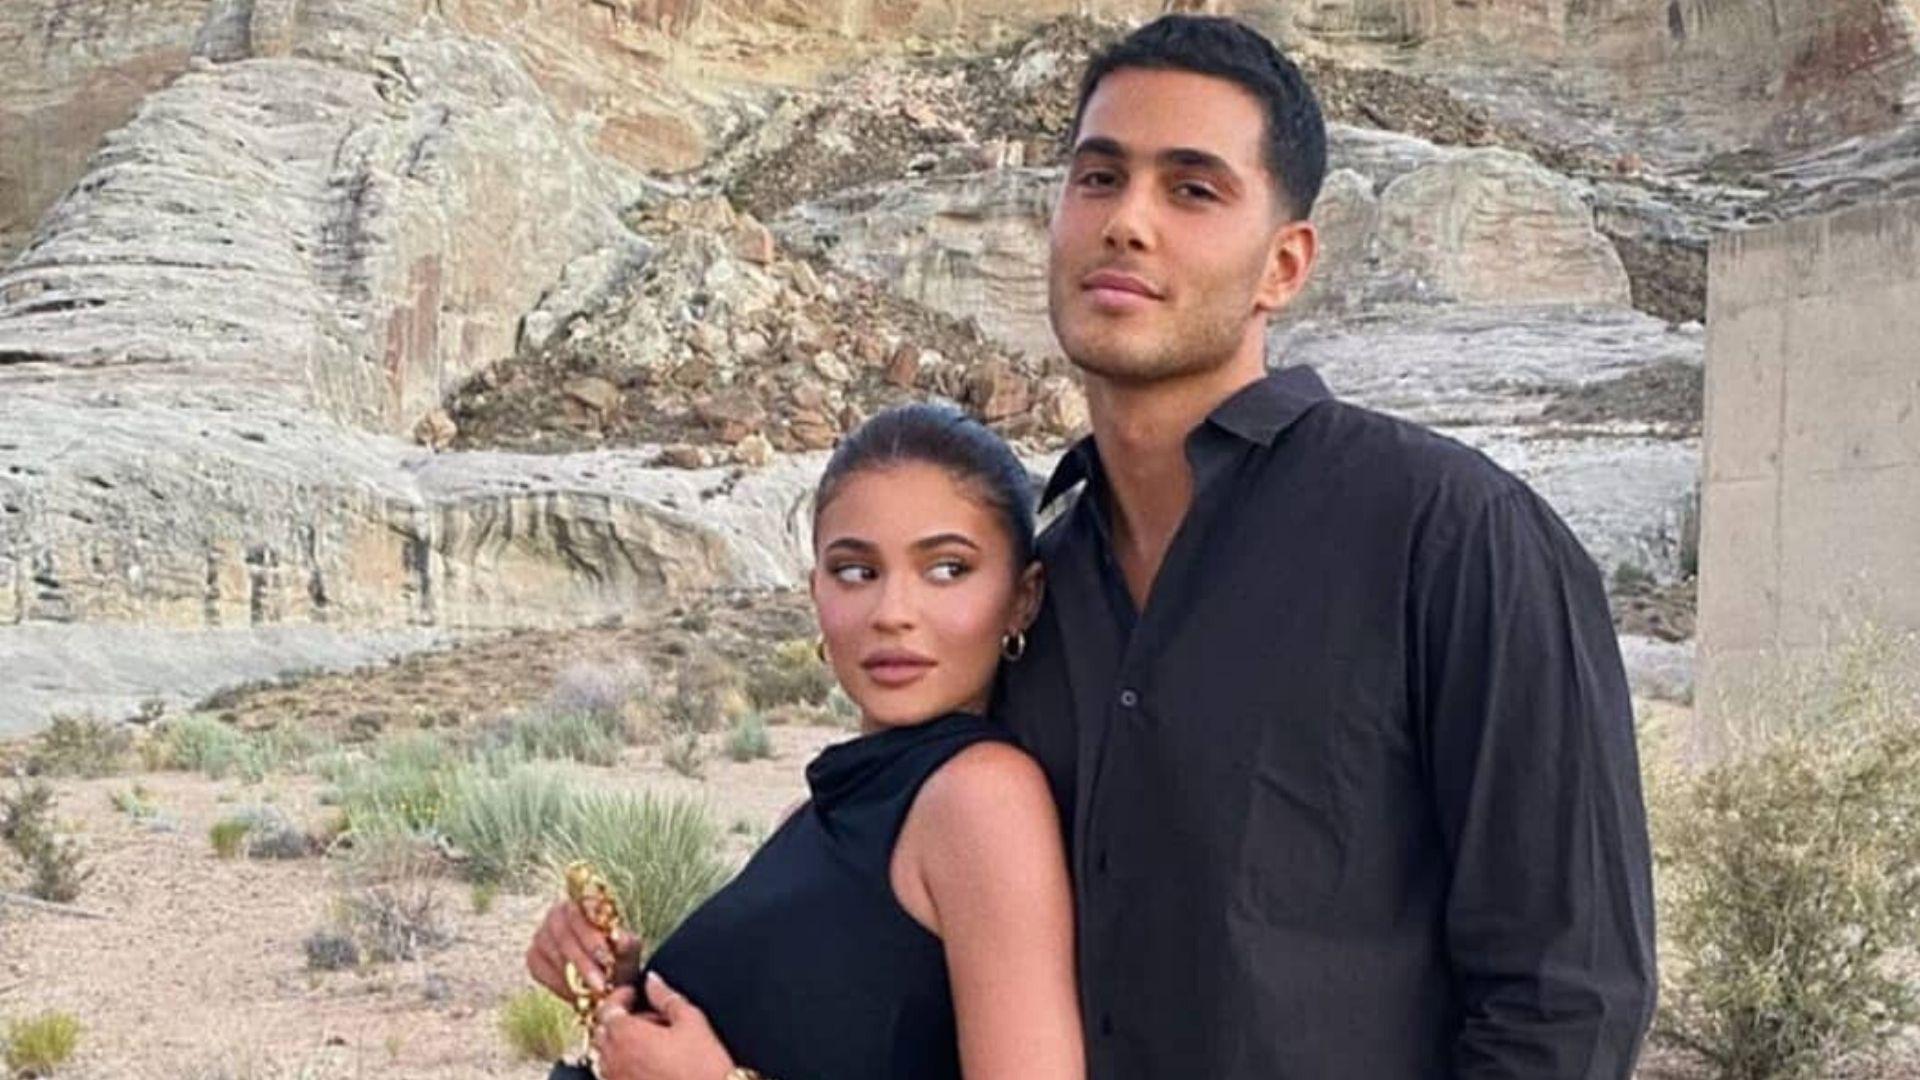 Who is Fai Khadra dating